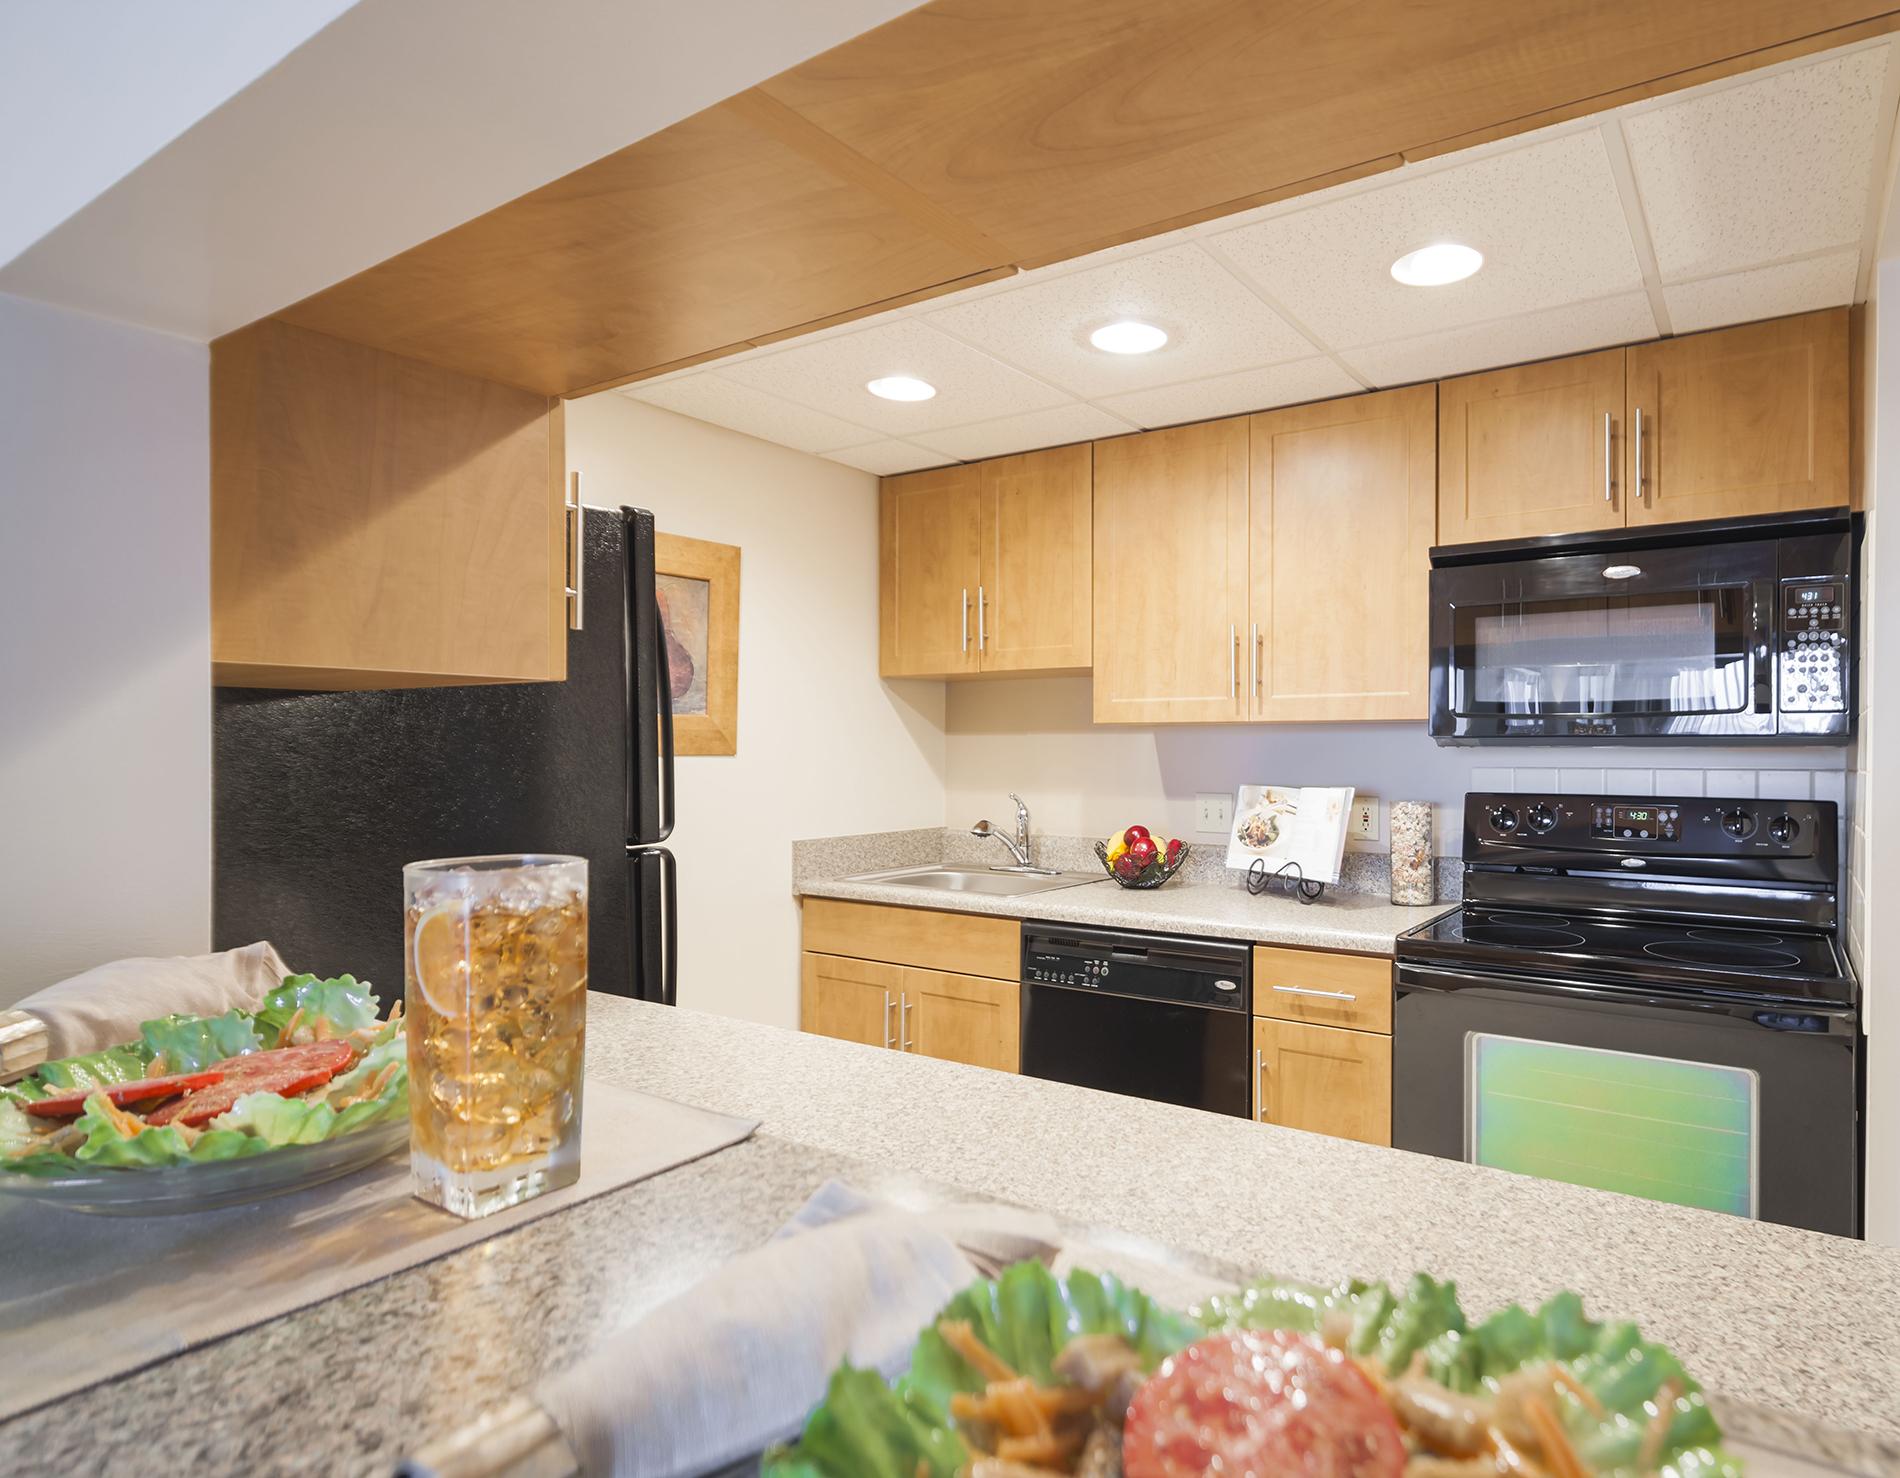 Kitchen of an apartment unit